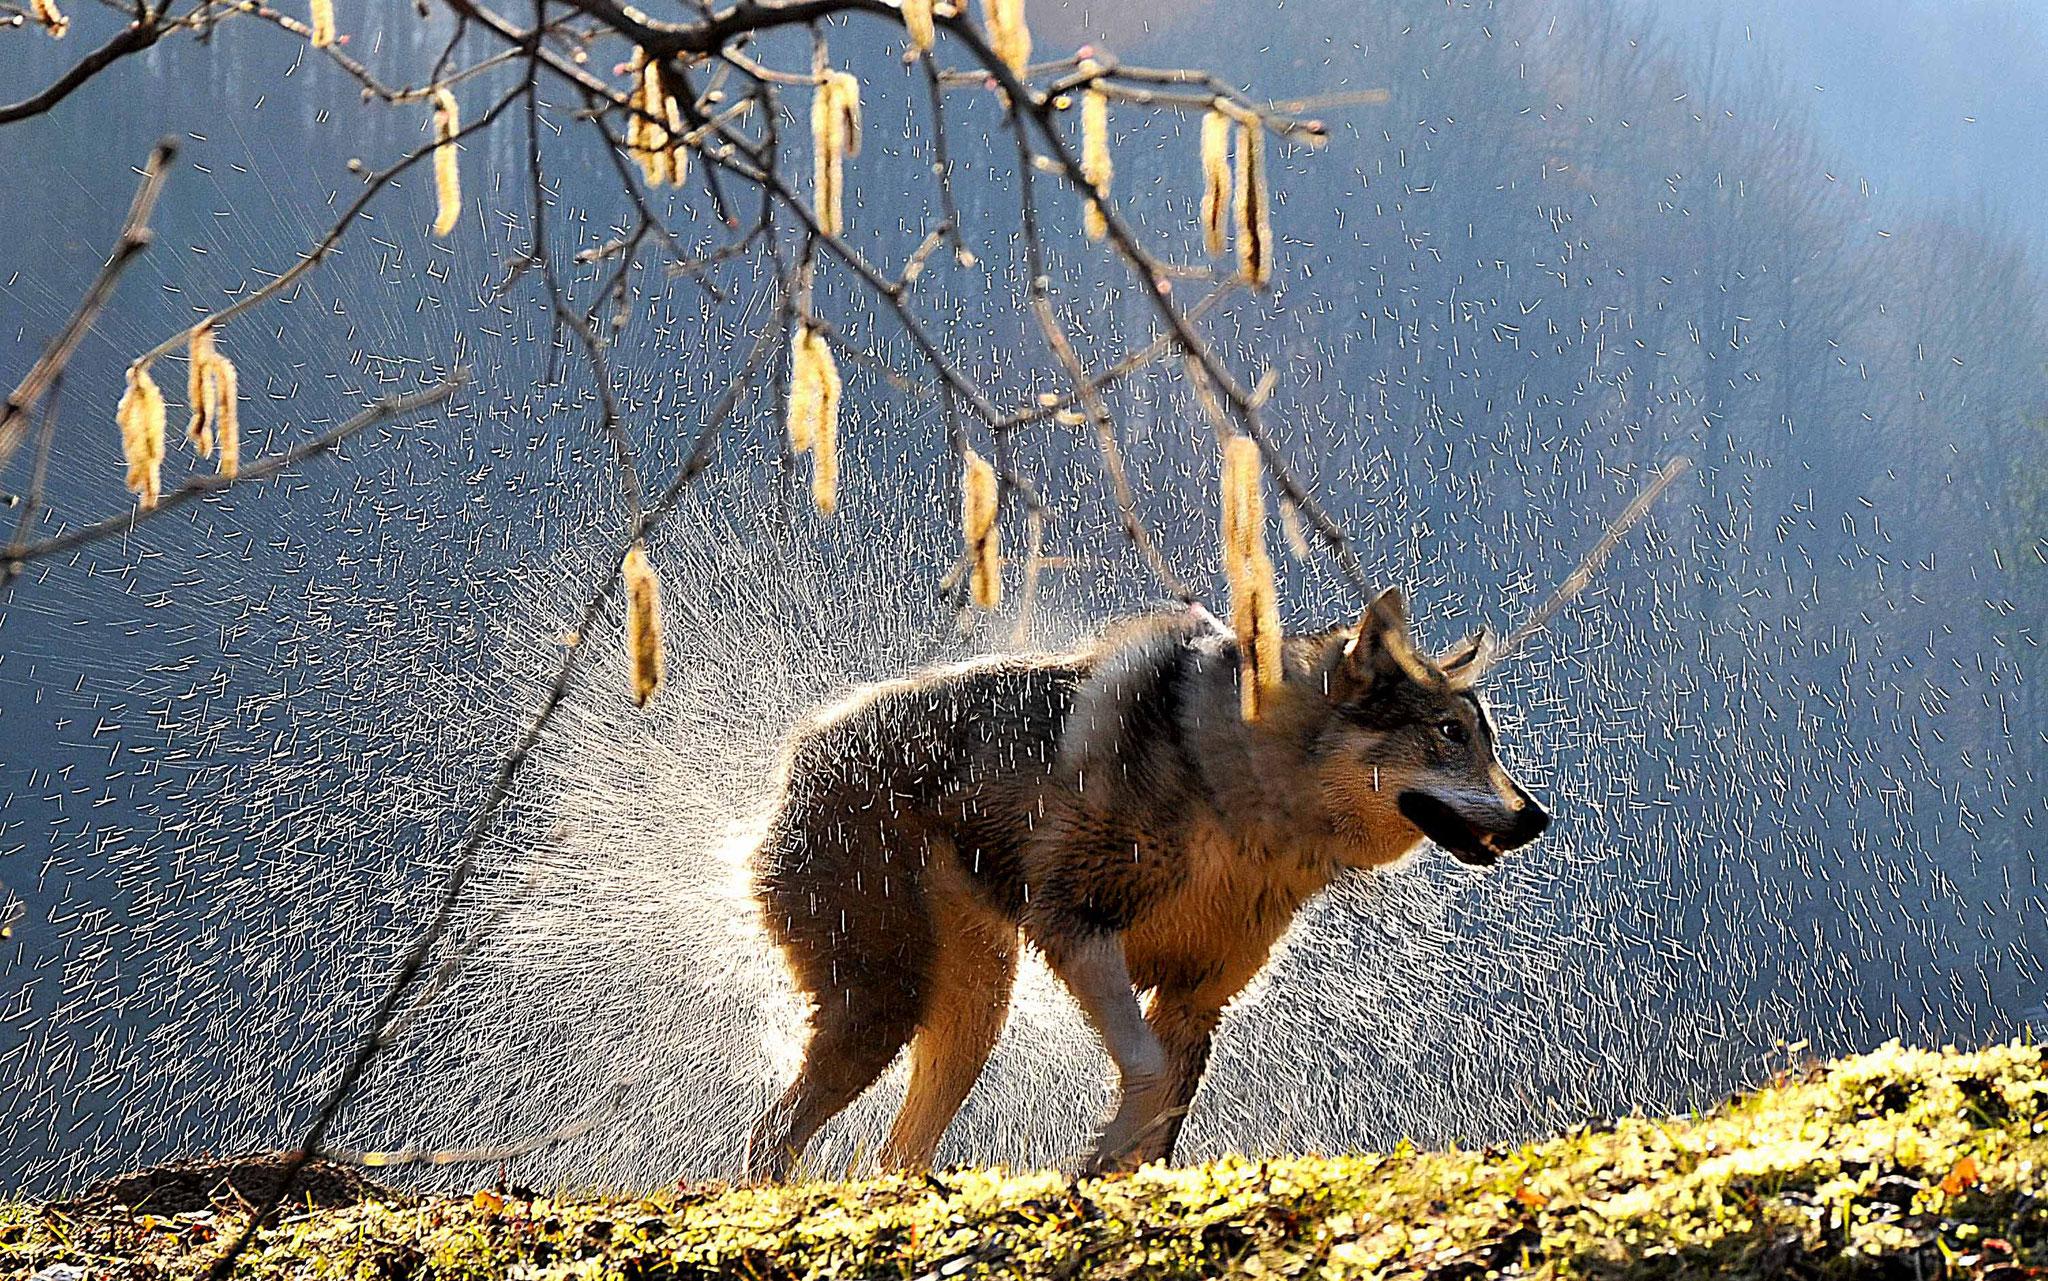 Vayl Fitskolynets (Ukraine) - Wolf in the forest